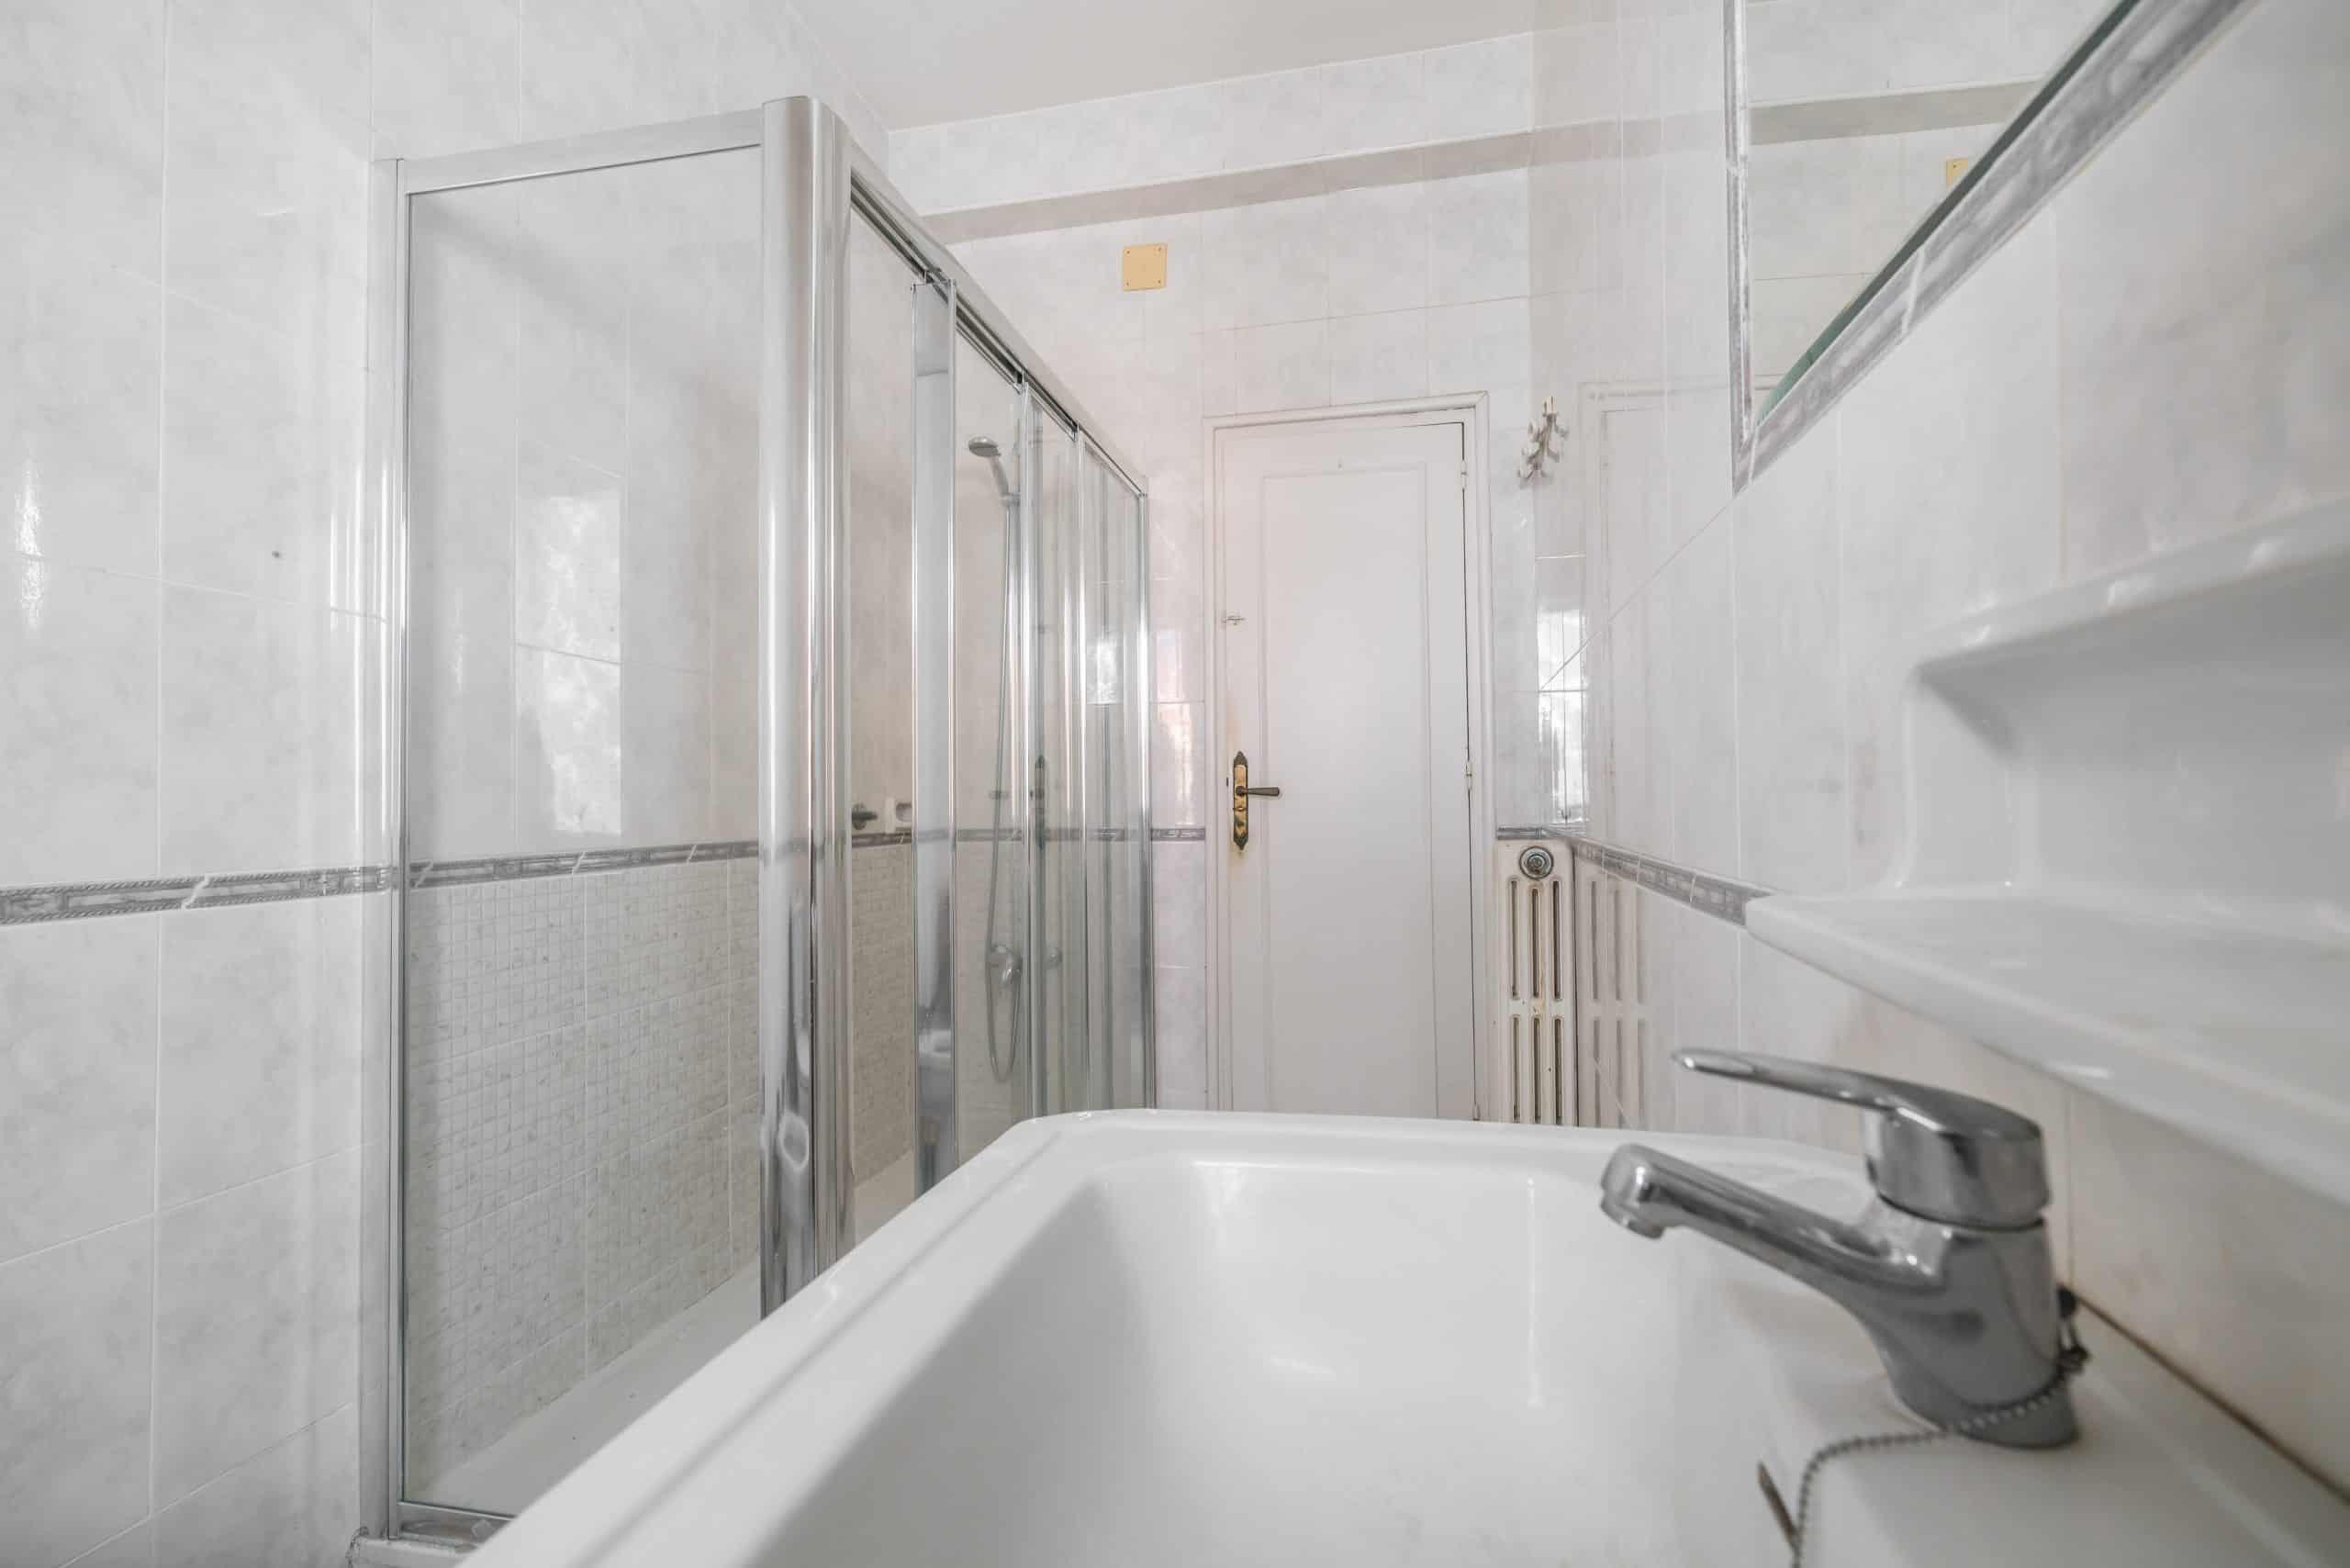 Agencia Inmobiliaria de Madrid-FUTUROCASA-Zona ARGANZUELA-EMBAJADORES-LEGAZPI -calle ALEJANDRO FERRANT -BAÑO1-1